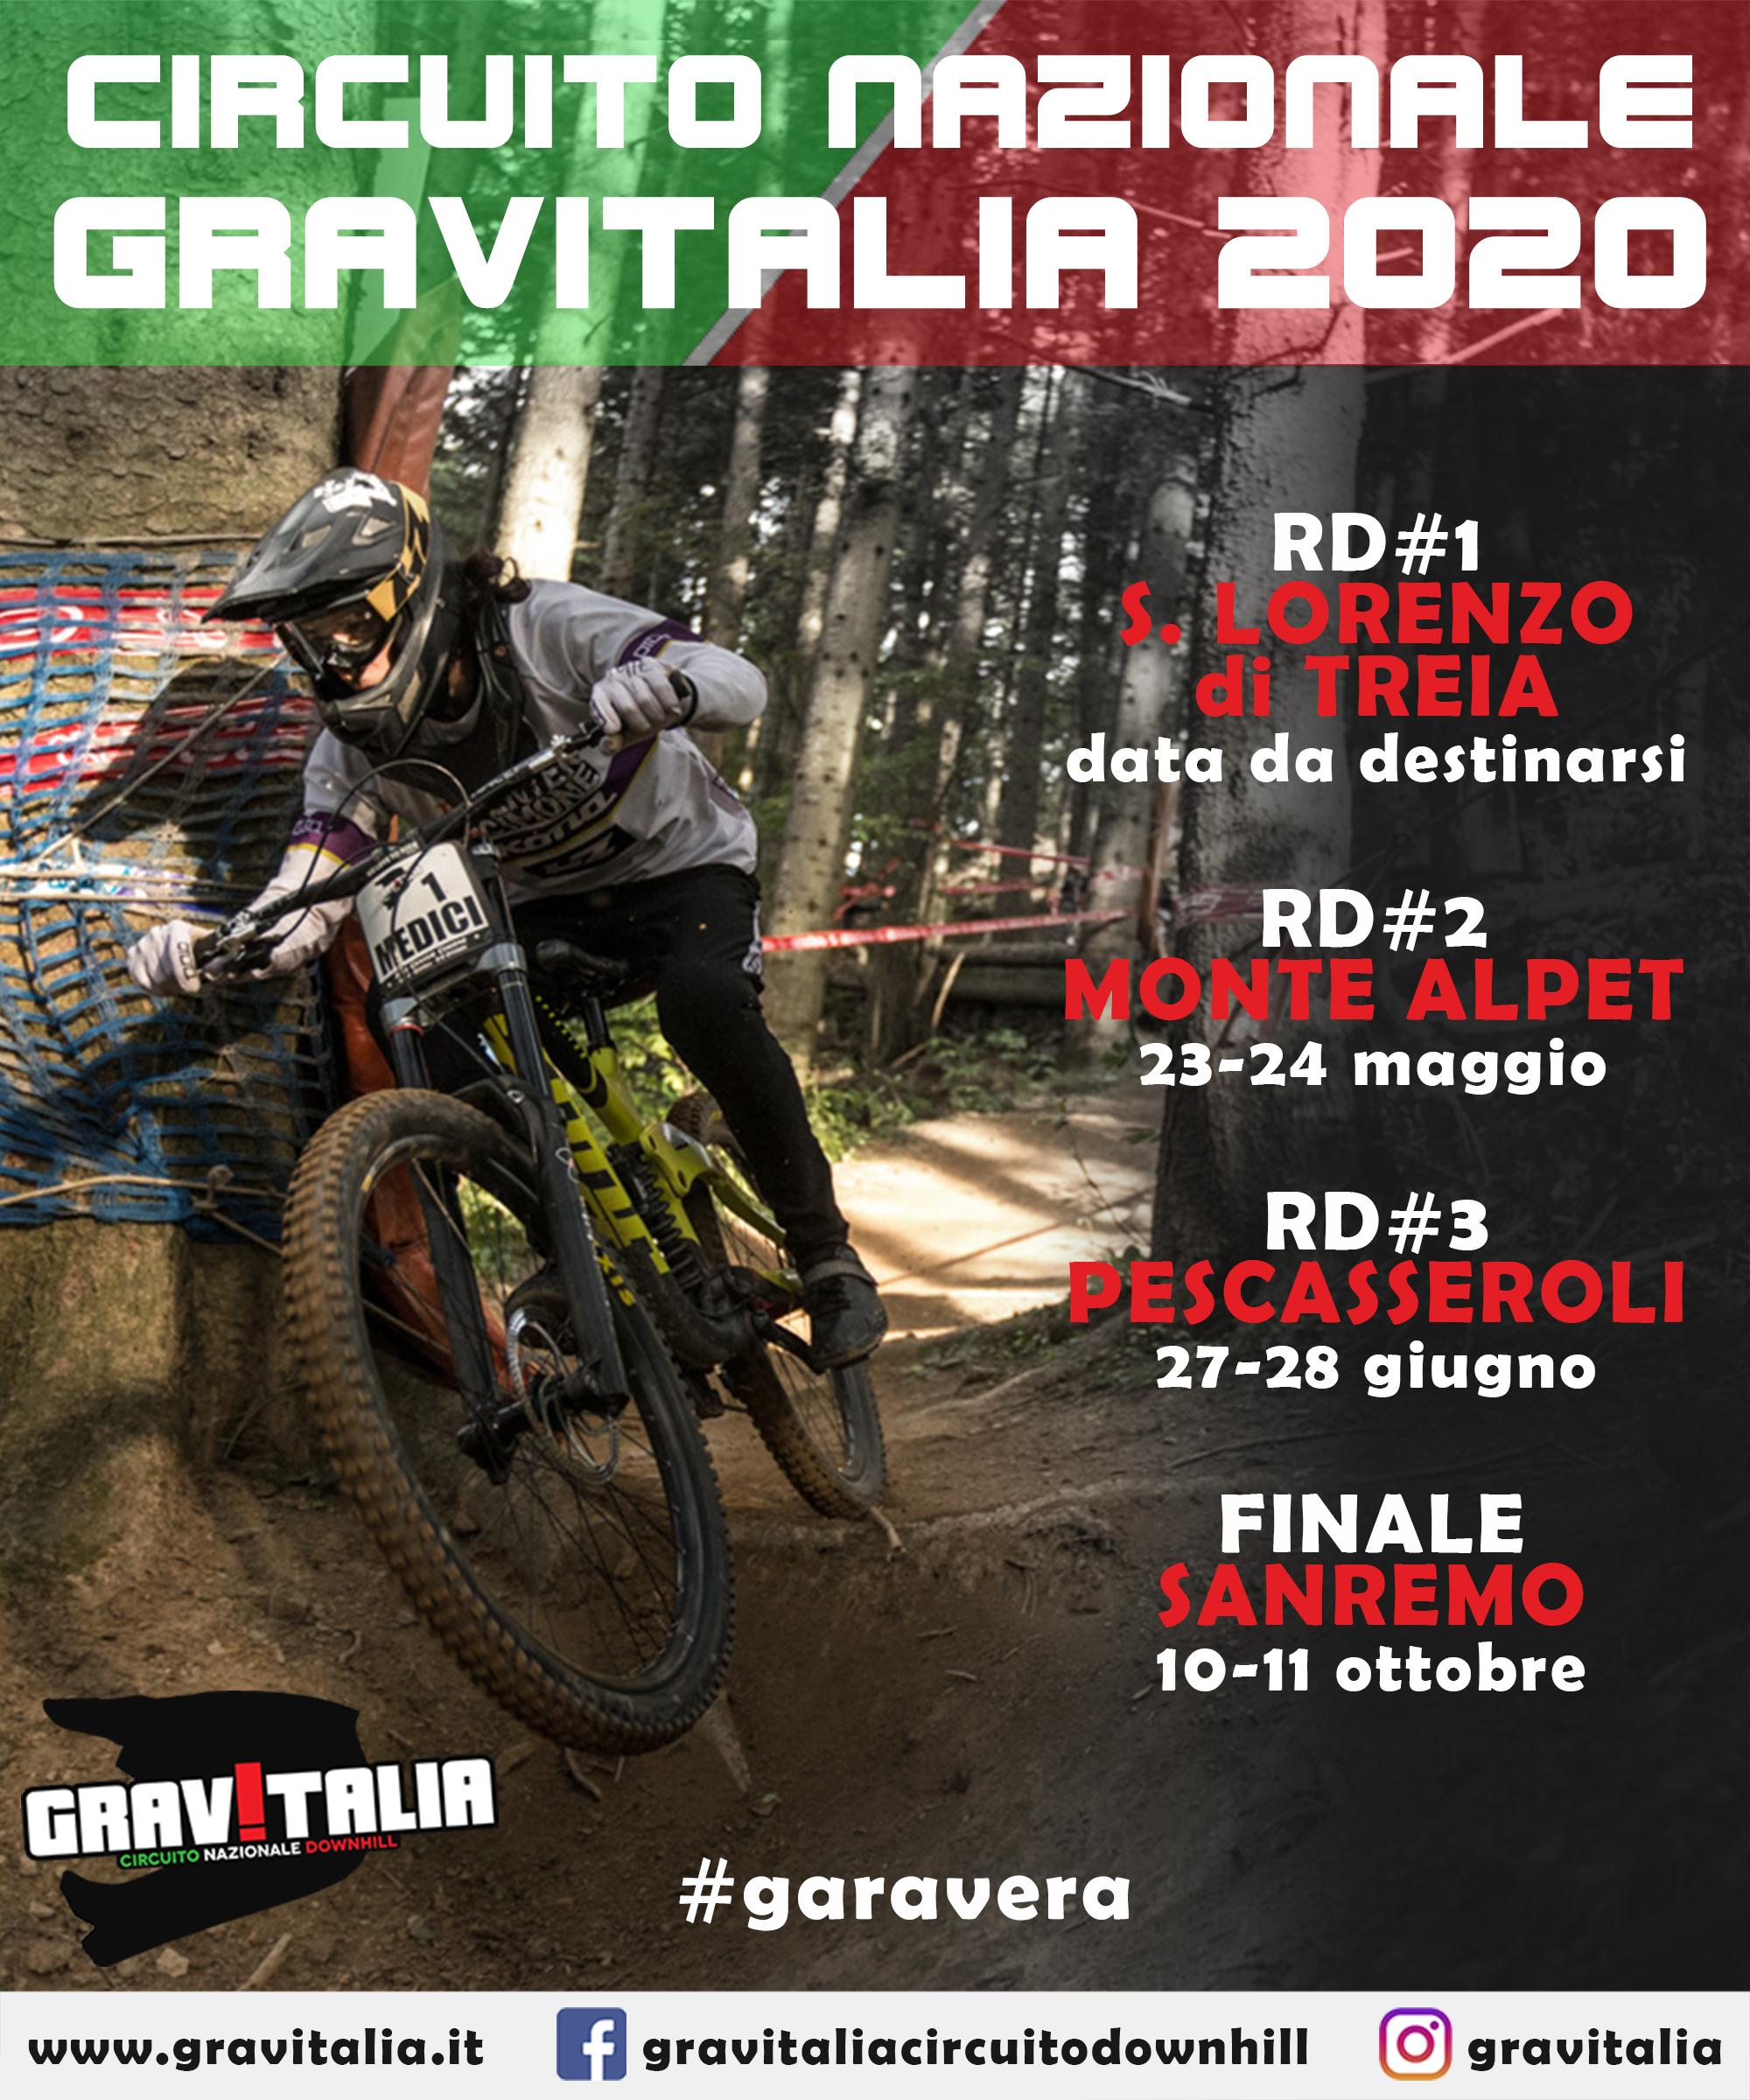 calendario_gravitalia_2020